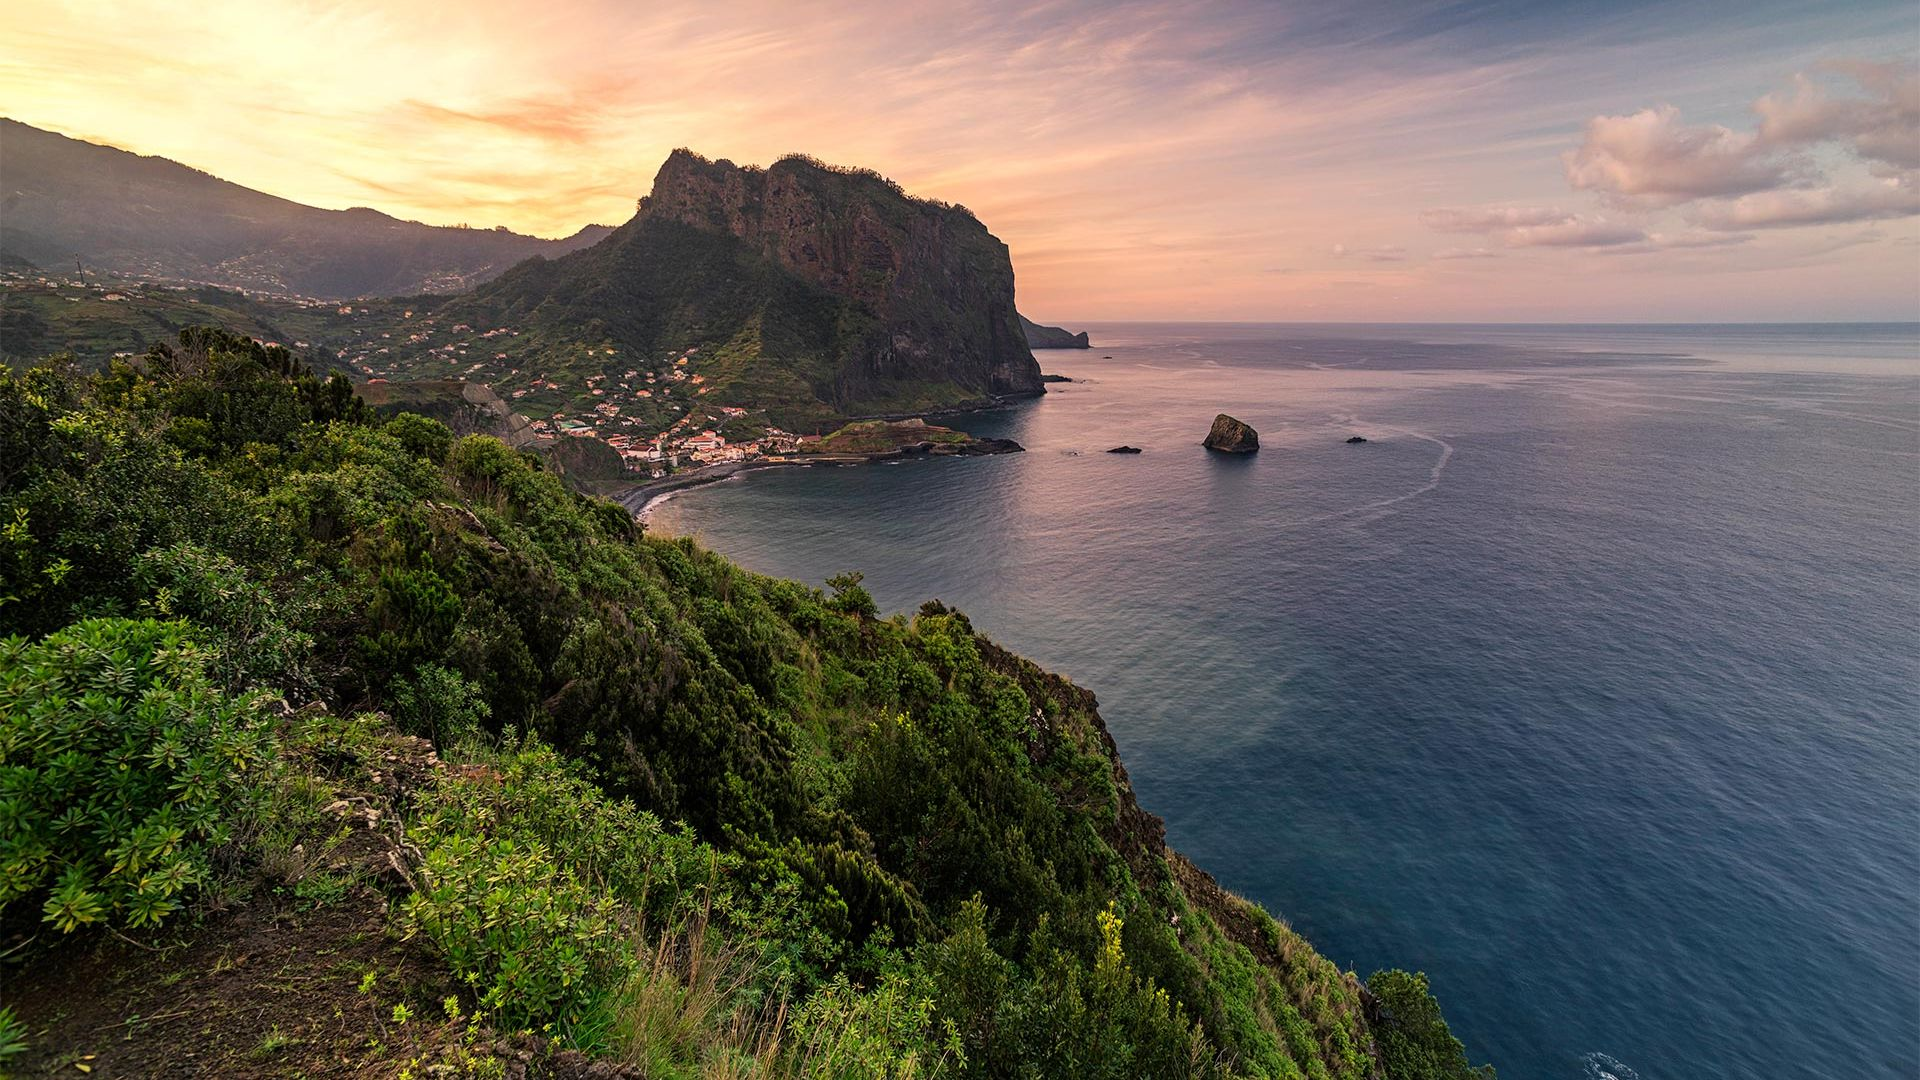 Sejur plaja Savoy Signature Madeira, 8 zile - 24 iulie 2021